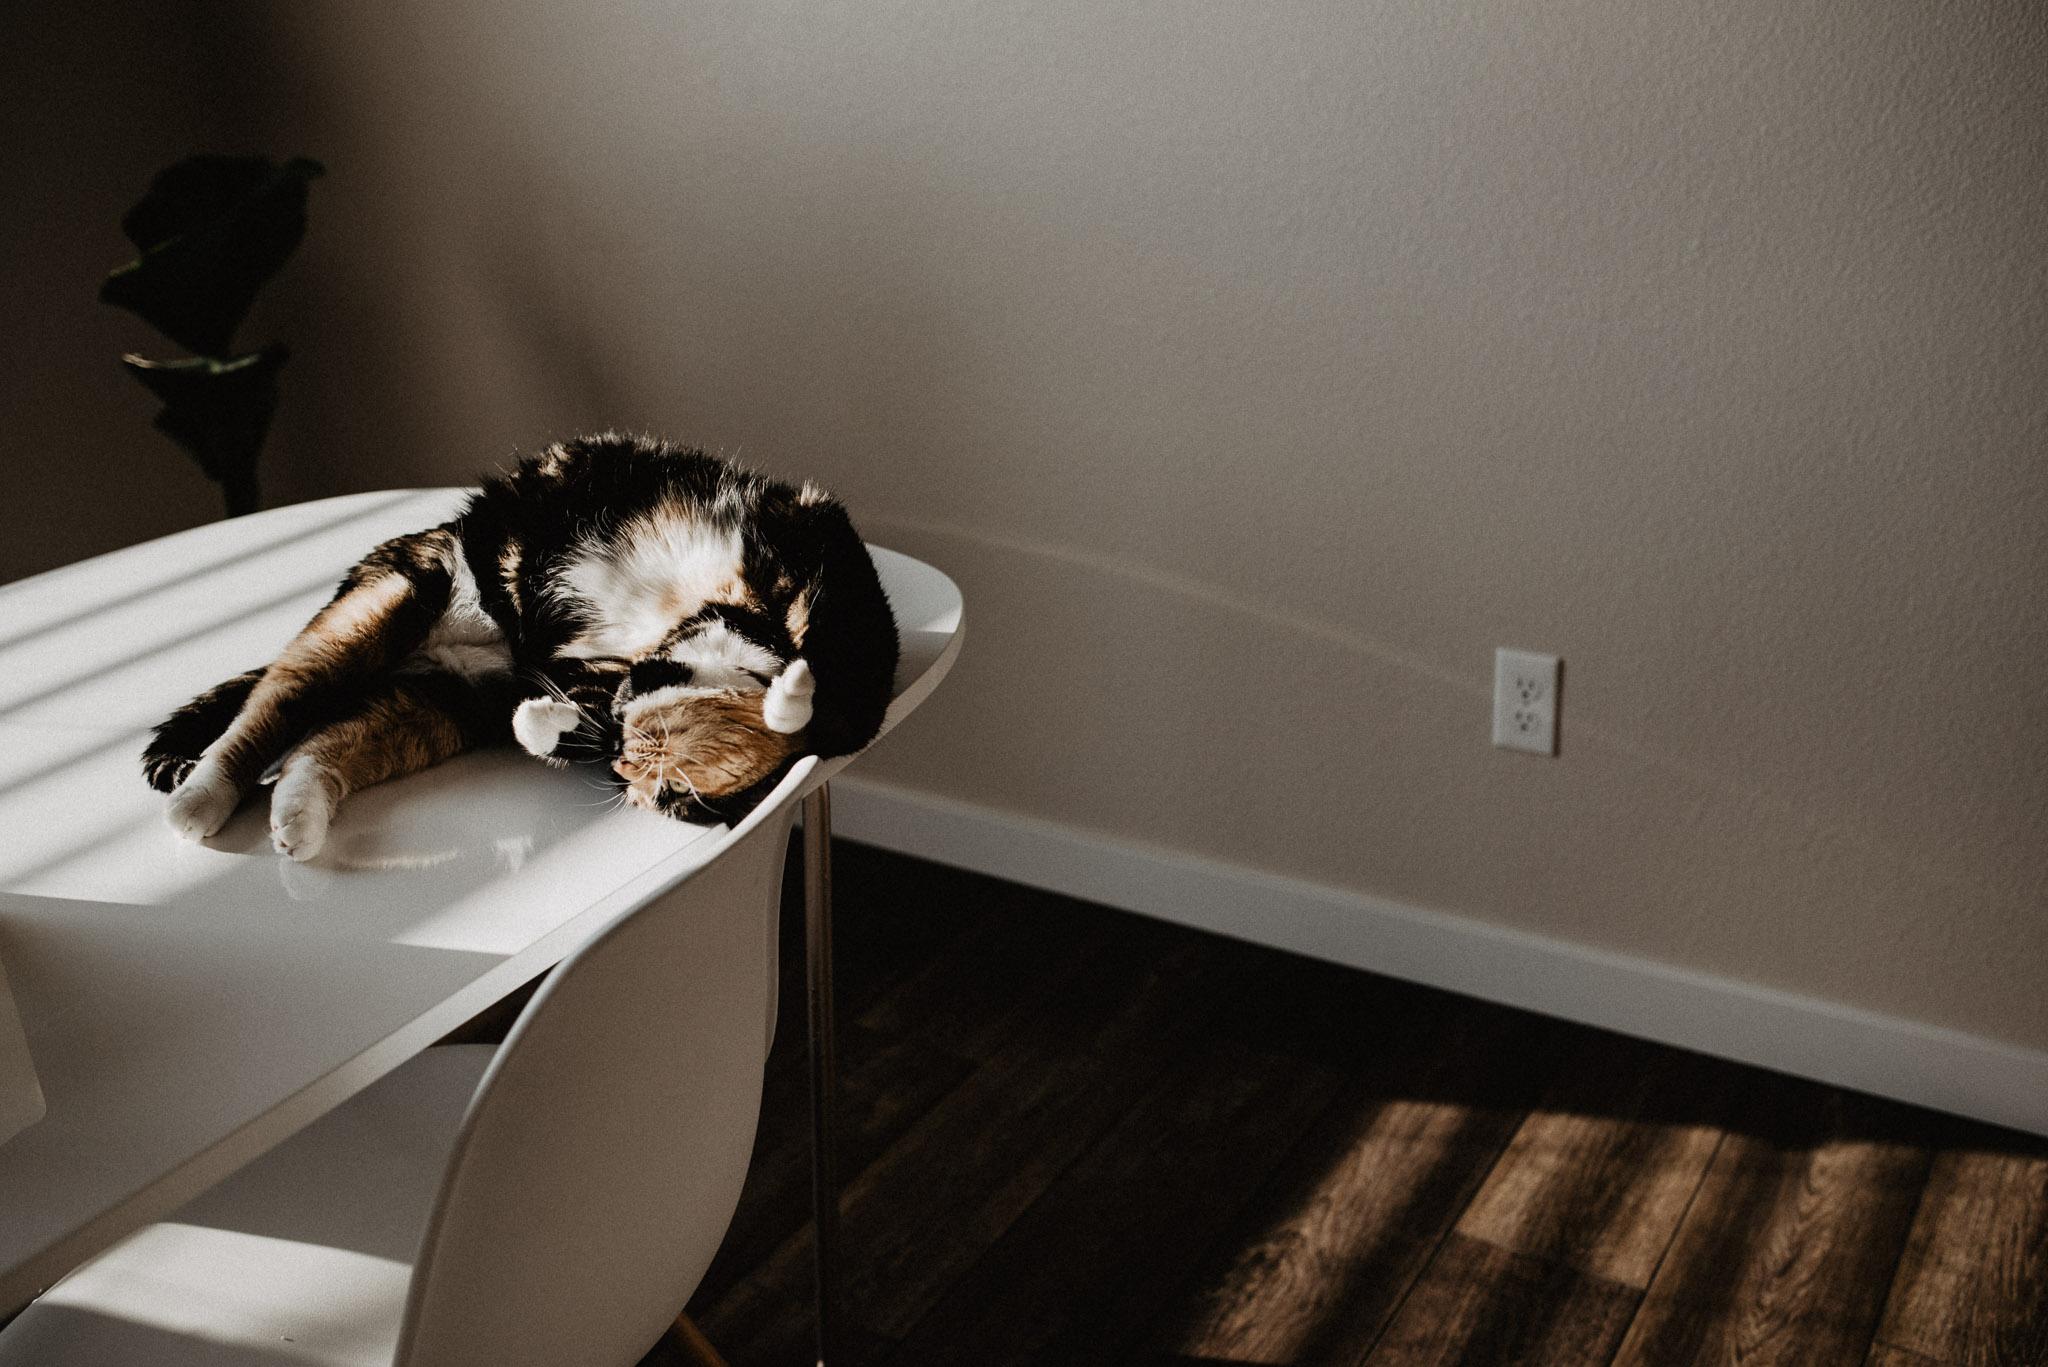 Boise Boudoir Photographer Boise Senior Photographer Makayla Madden Photography Mid Century Modern Kitchen Table Chairs Decor Kitty